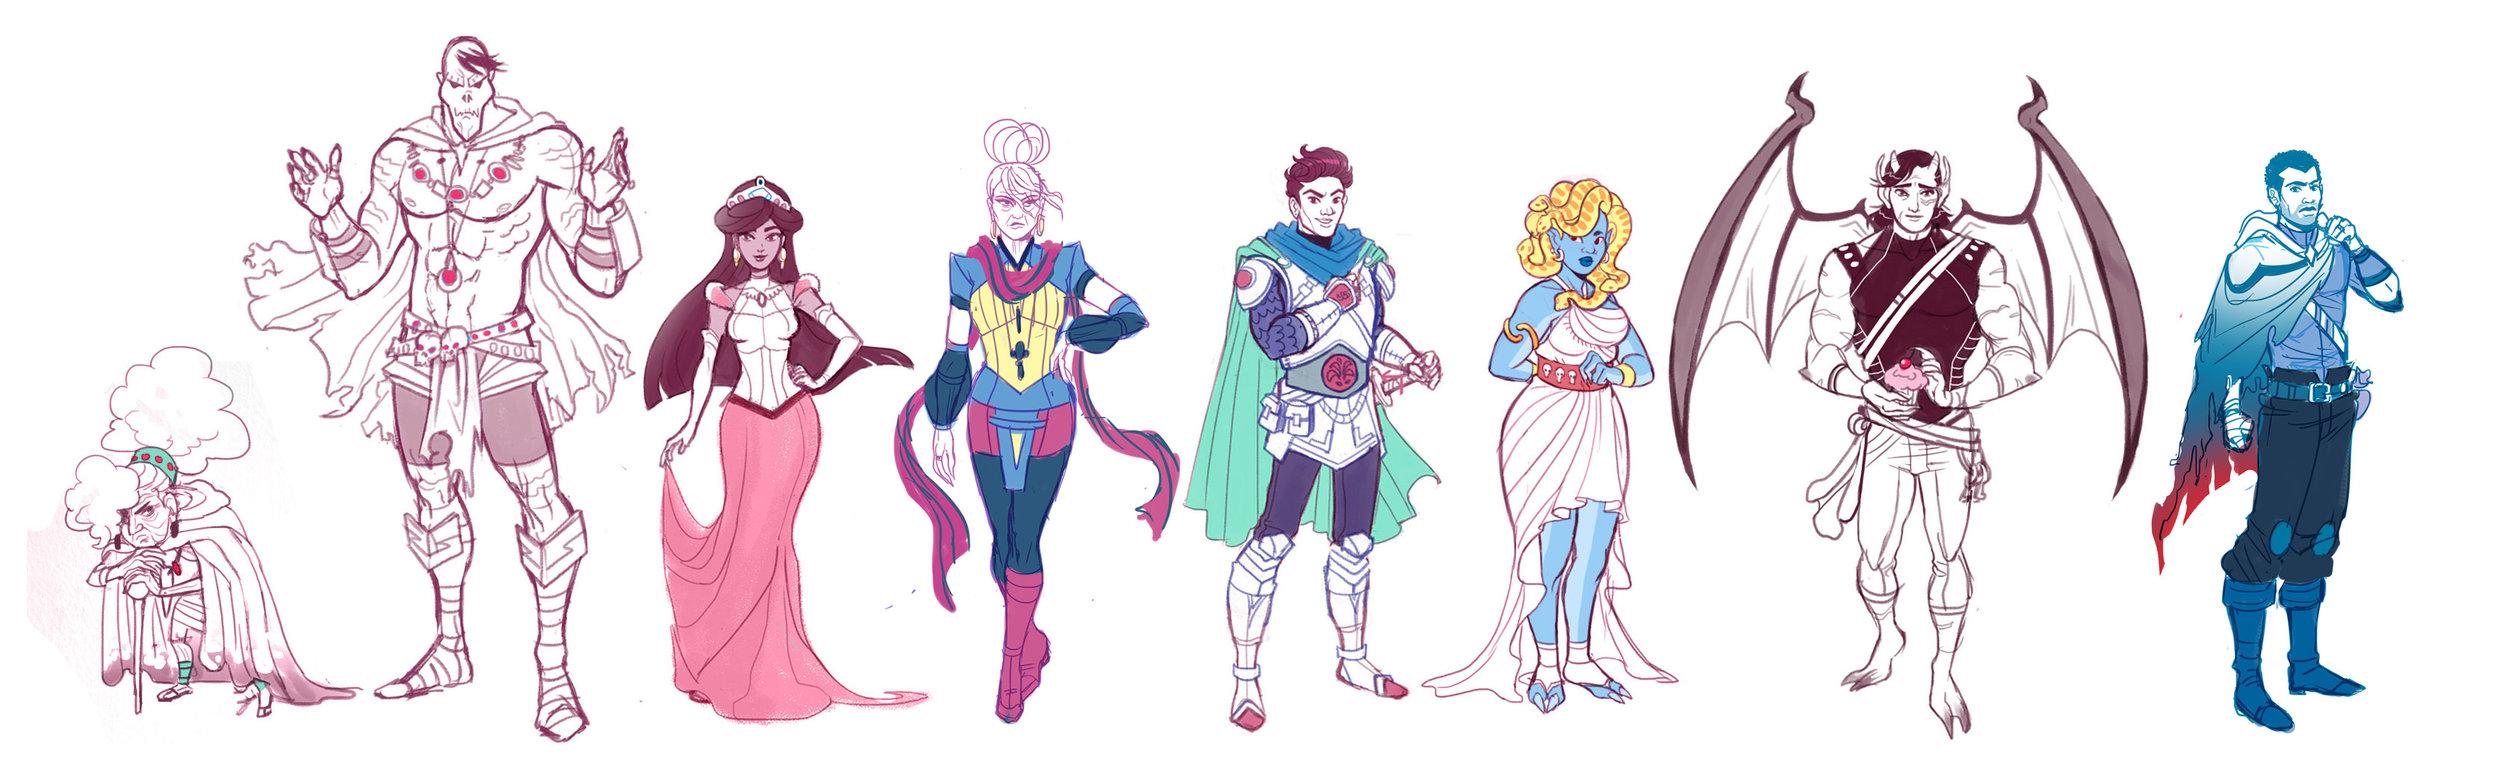 Full character lineup.